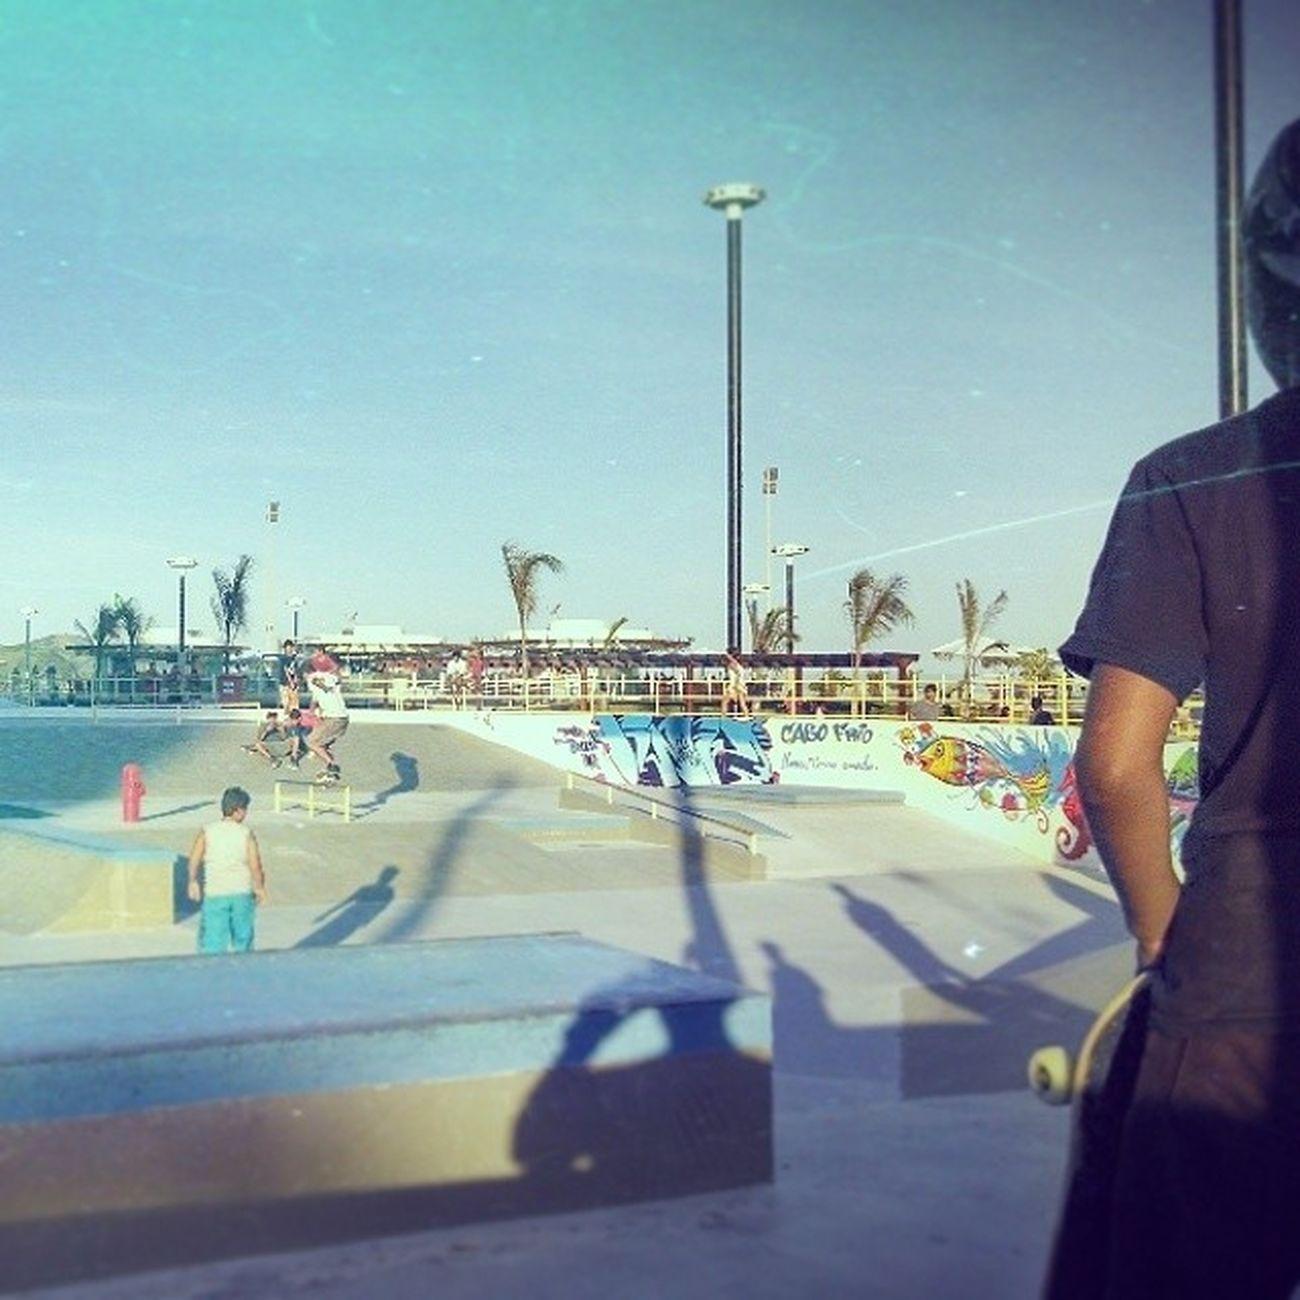 Skatepark Allan Mesquita | Cabo Frio Sk8 Skate Skatepark Allanmesquita city street instafilter sport brazil cabofrio